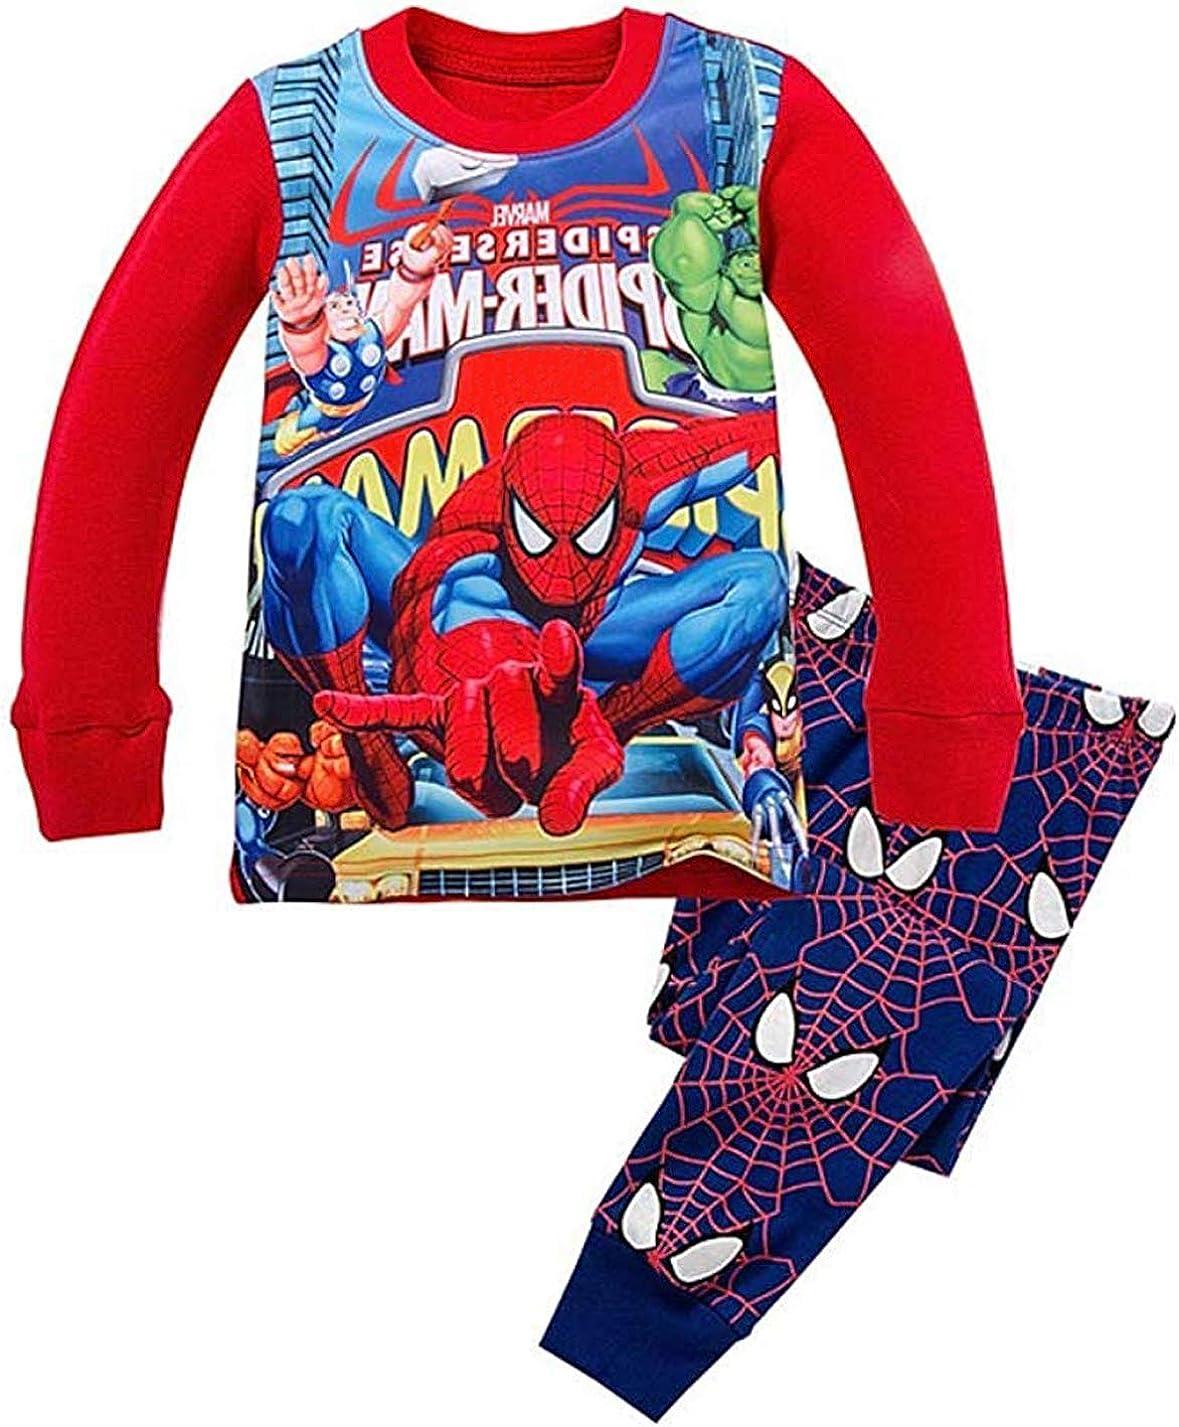 N'aix Little Recommendation Boys Cotton Pajamas Max 42% OFF Cartoon Super Sleepwears Kid`s